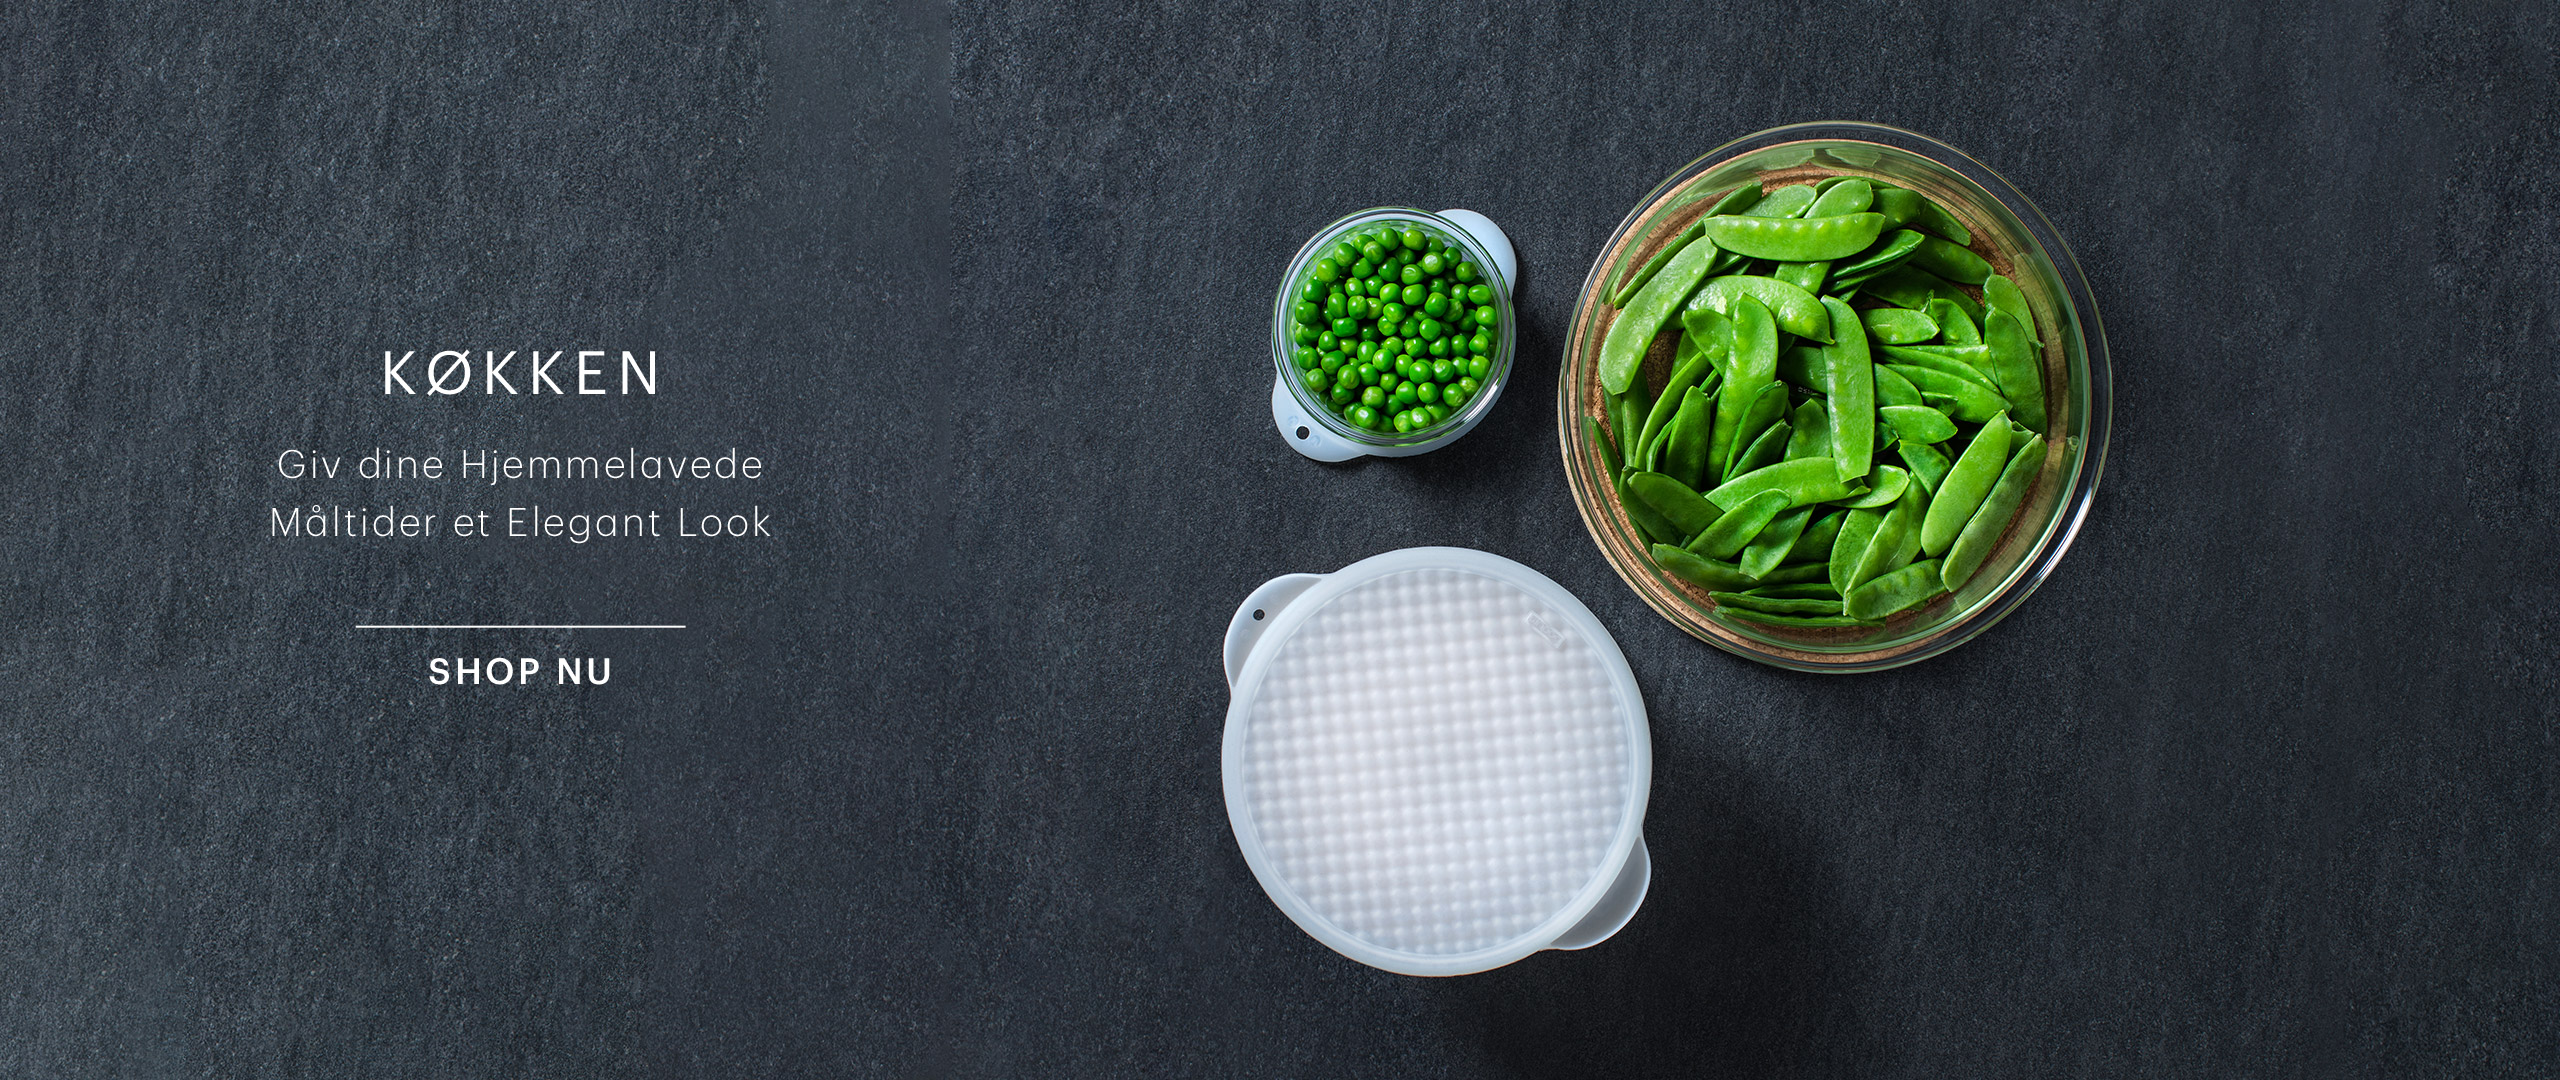 BEU [DK] - Kitchen